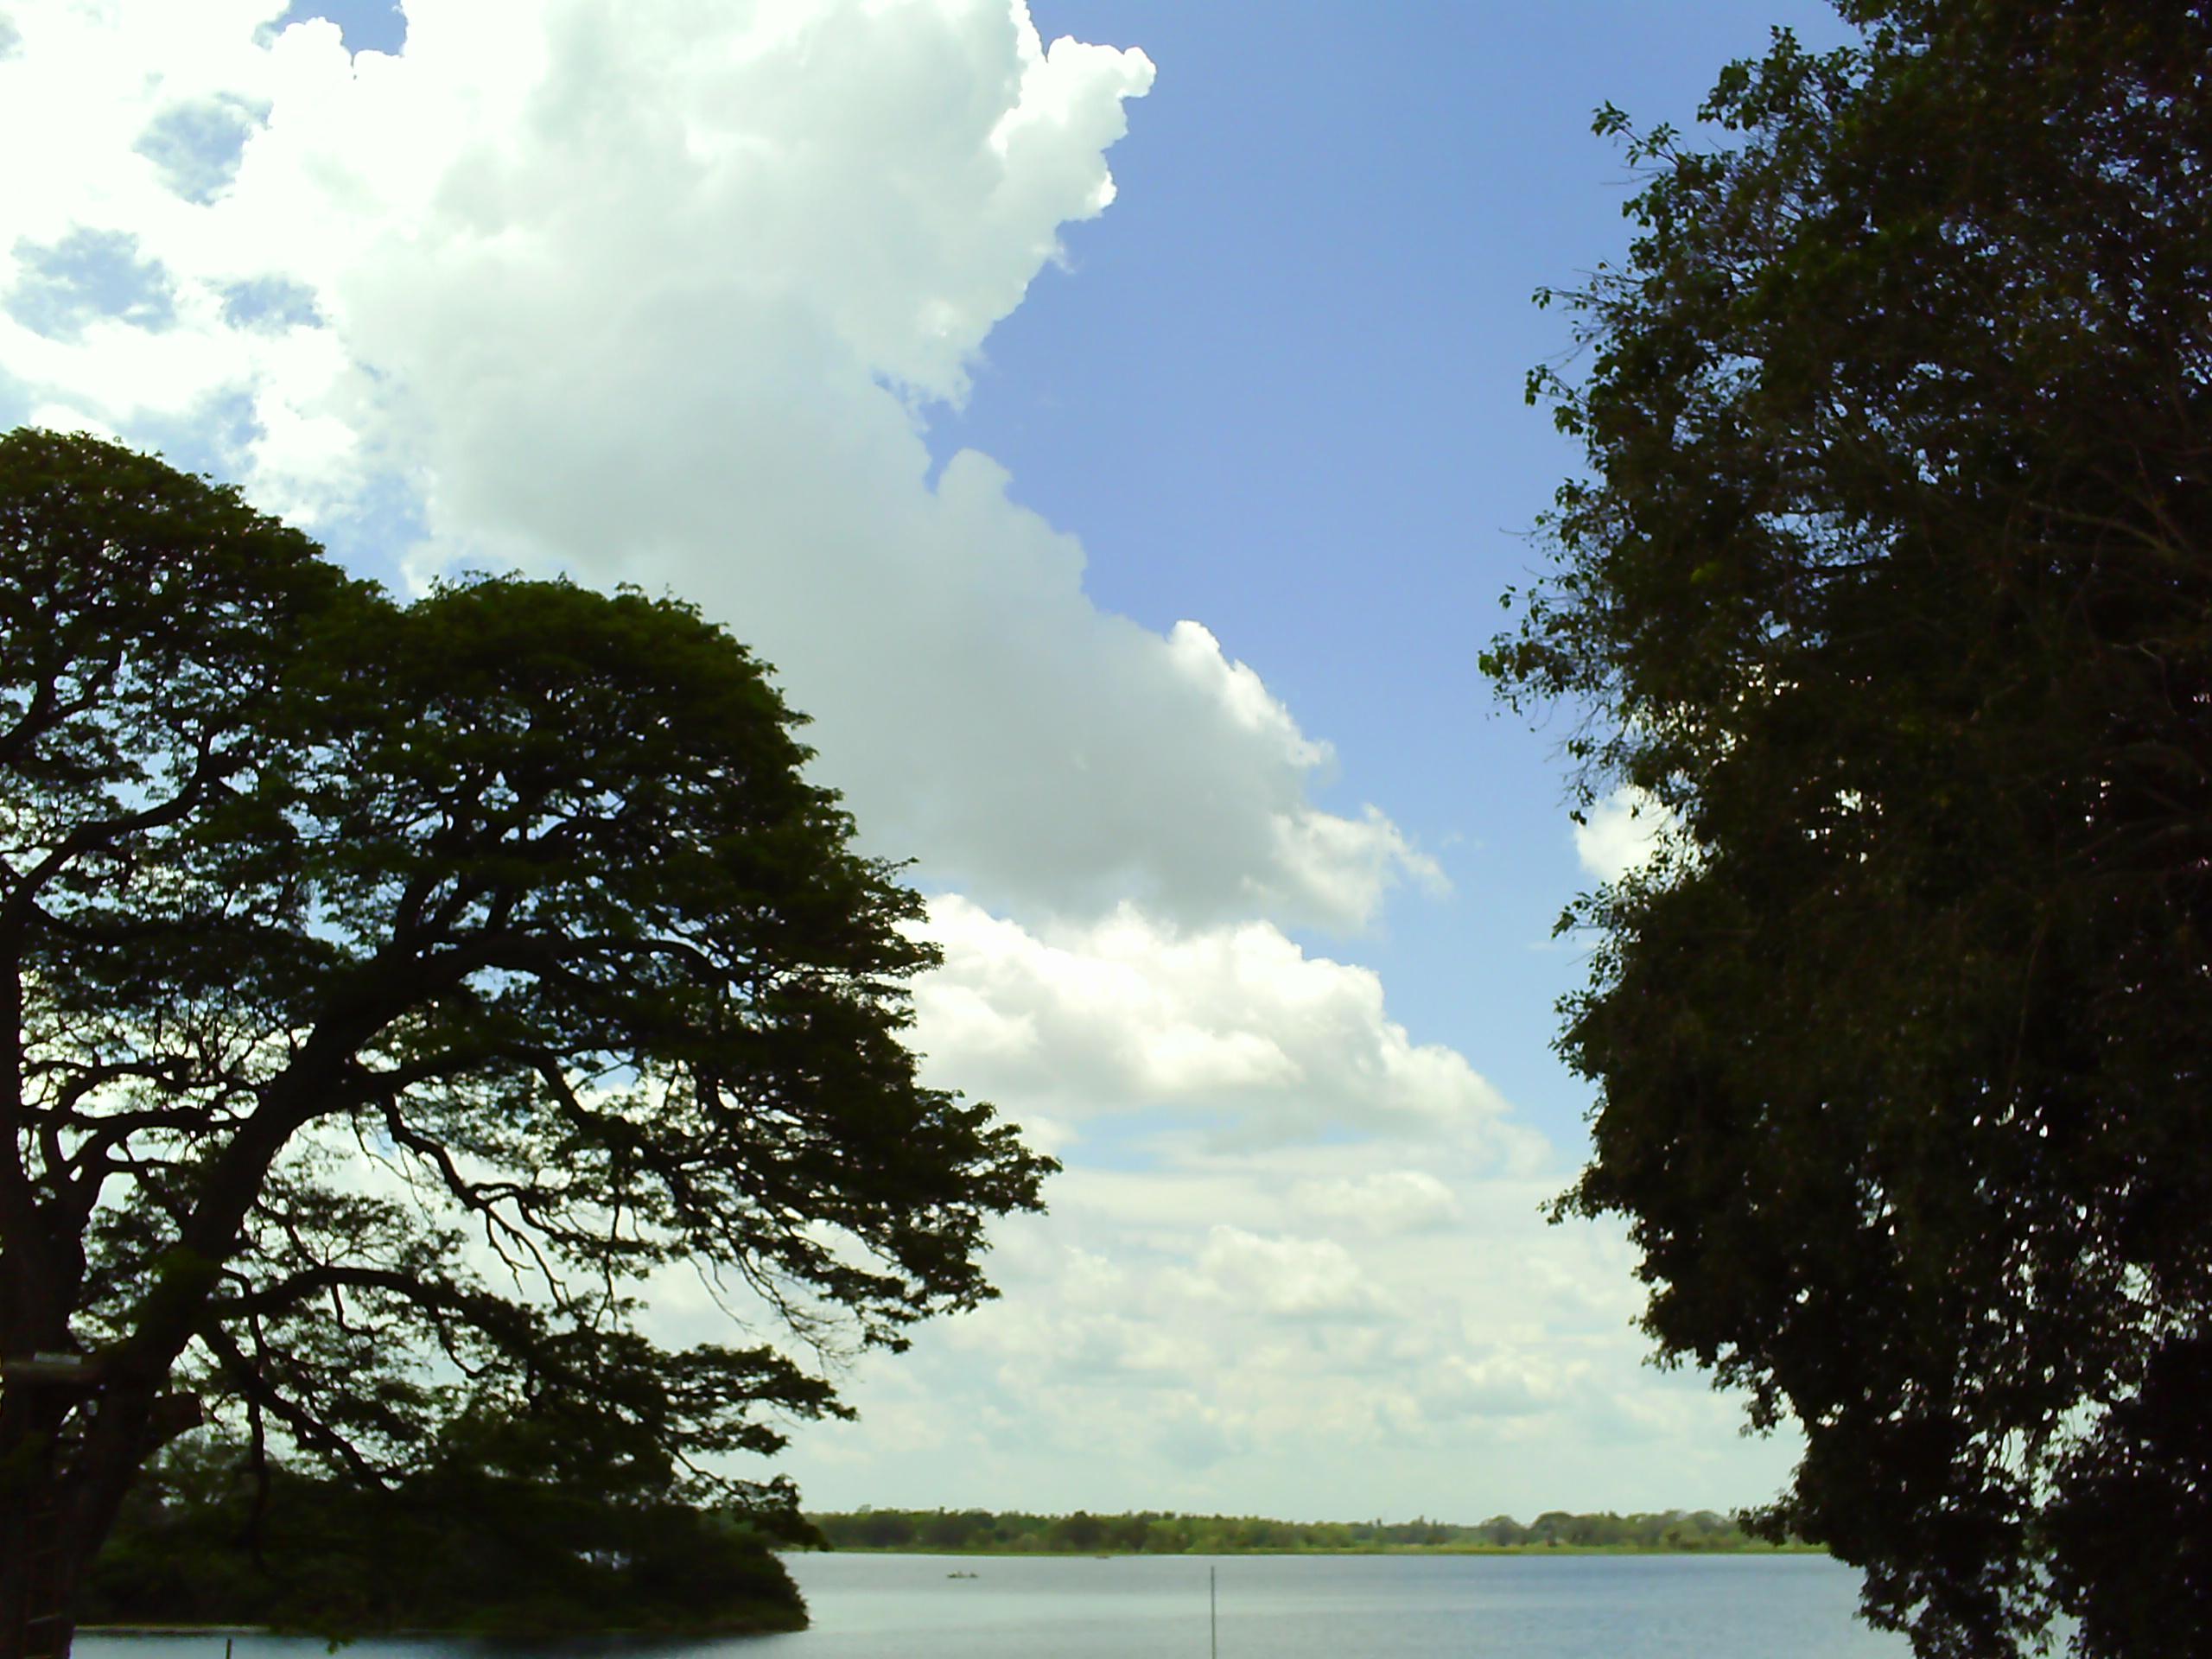 Nidikumba, Hotels, River National Park